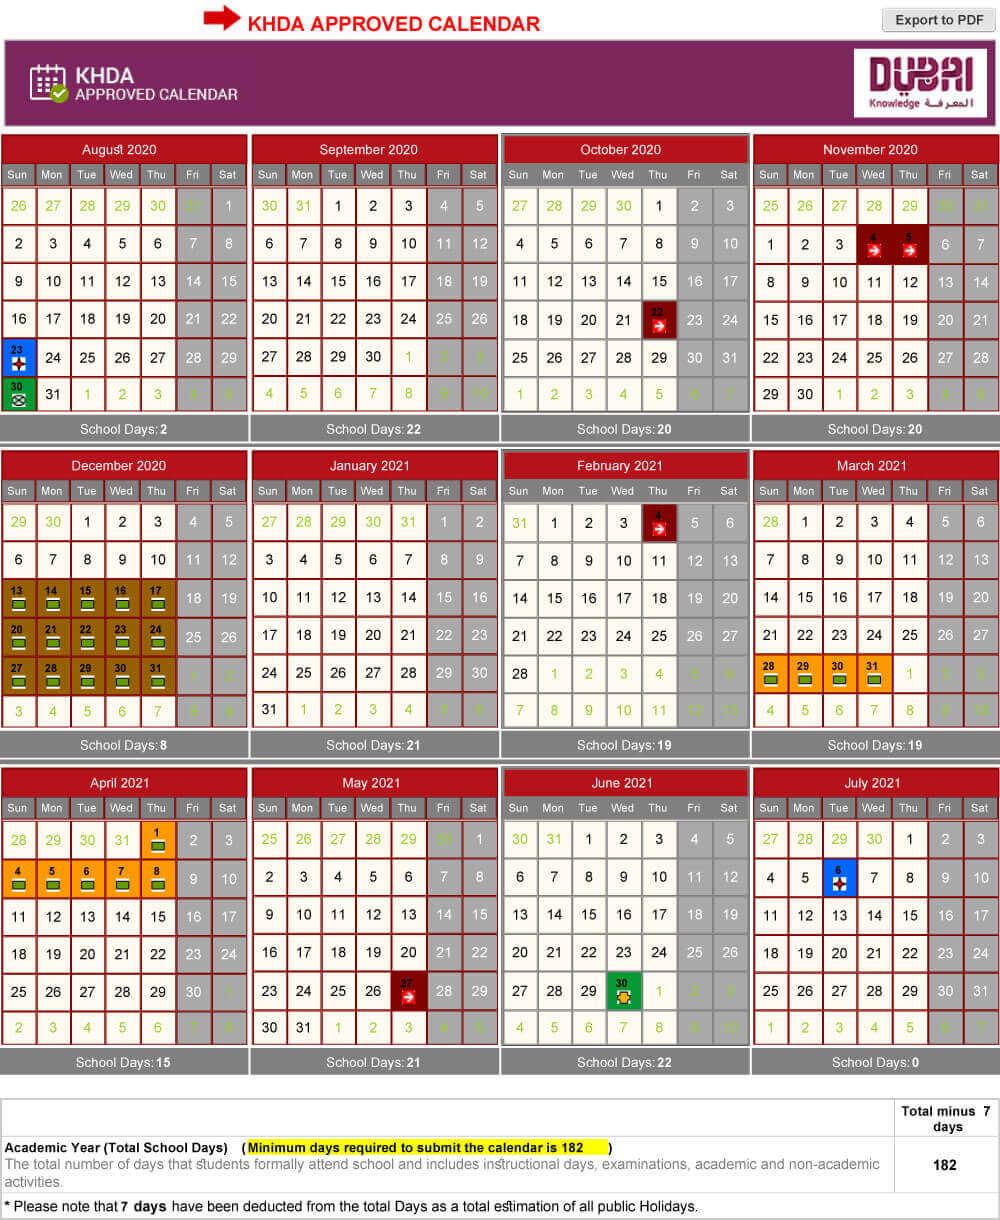 KHDA Approved School Calendar 2020